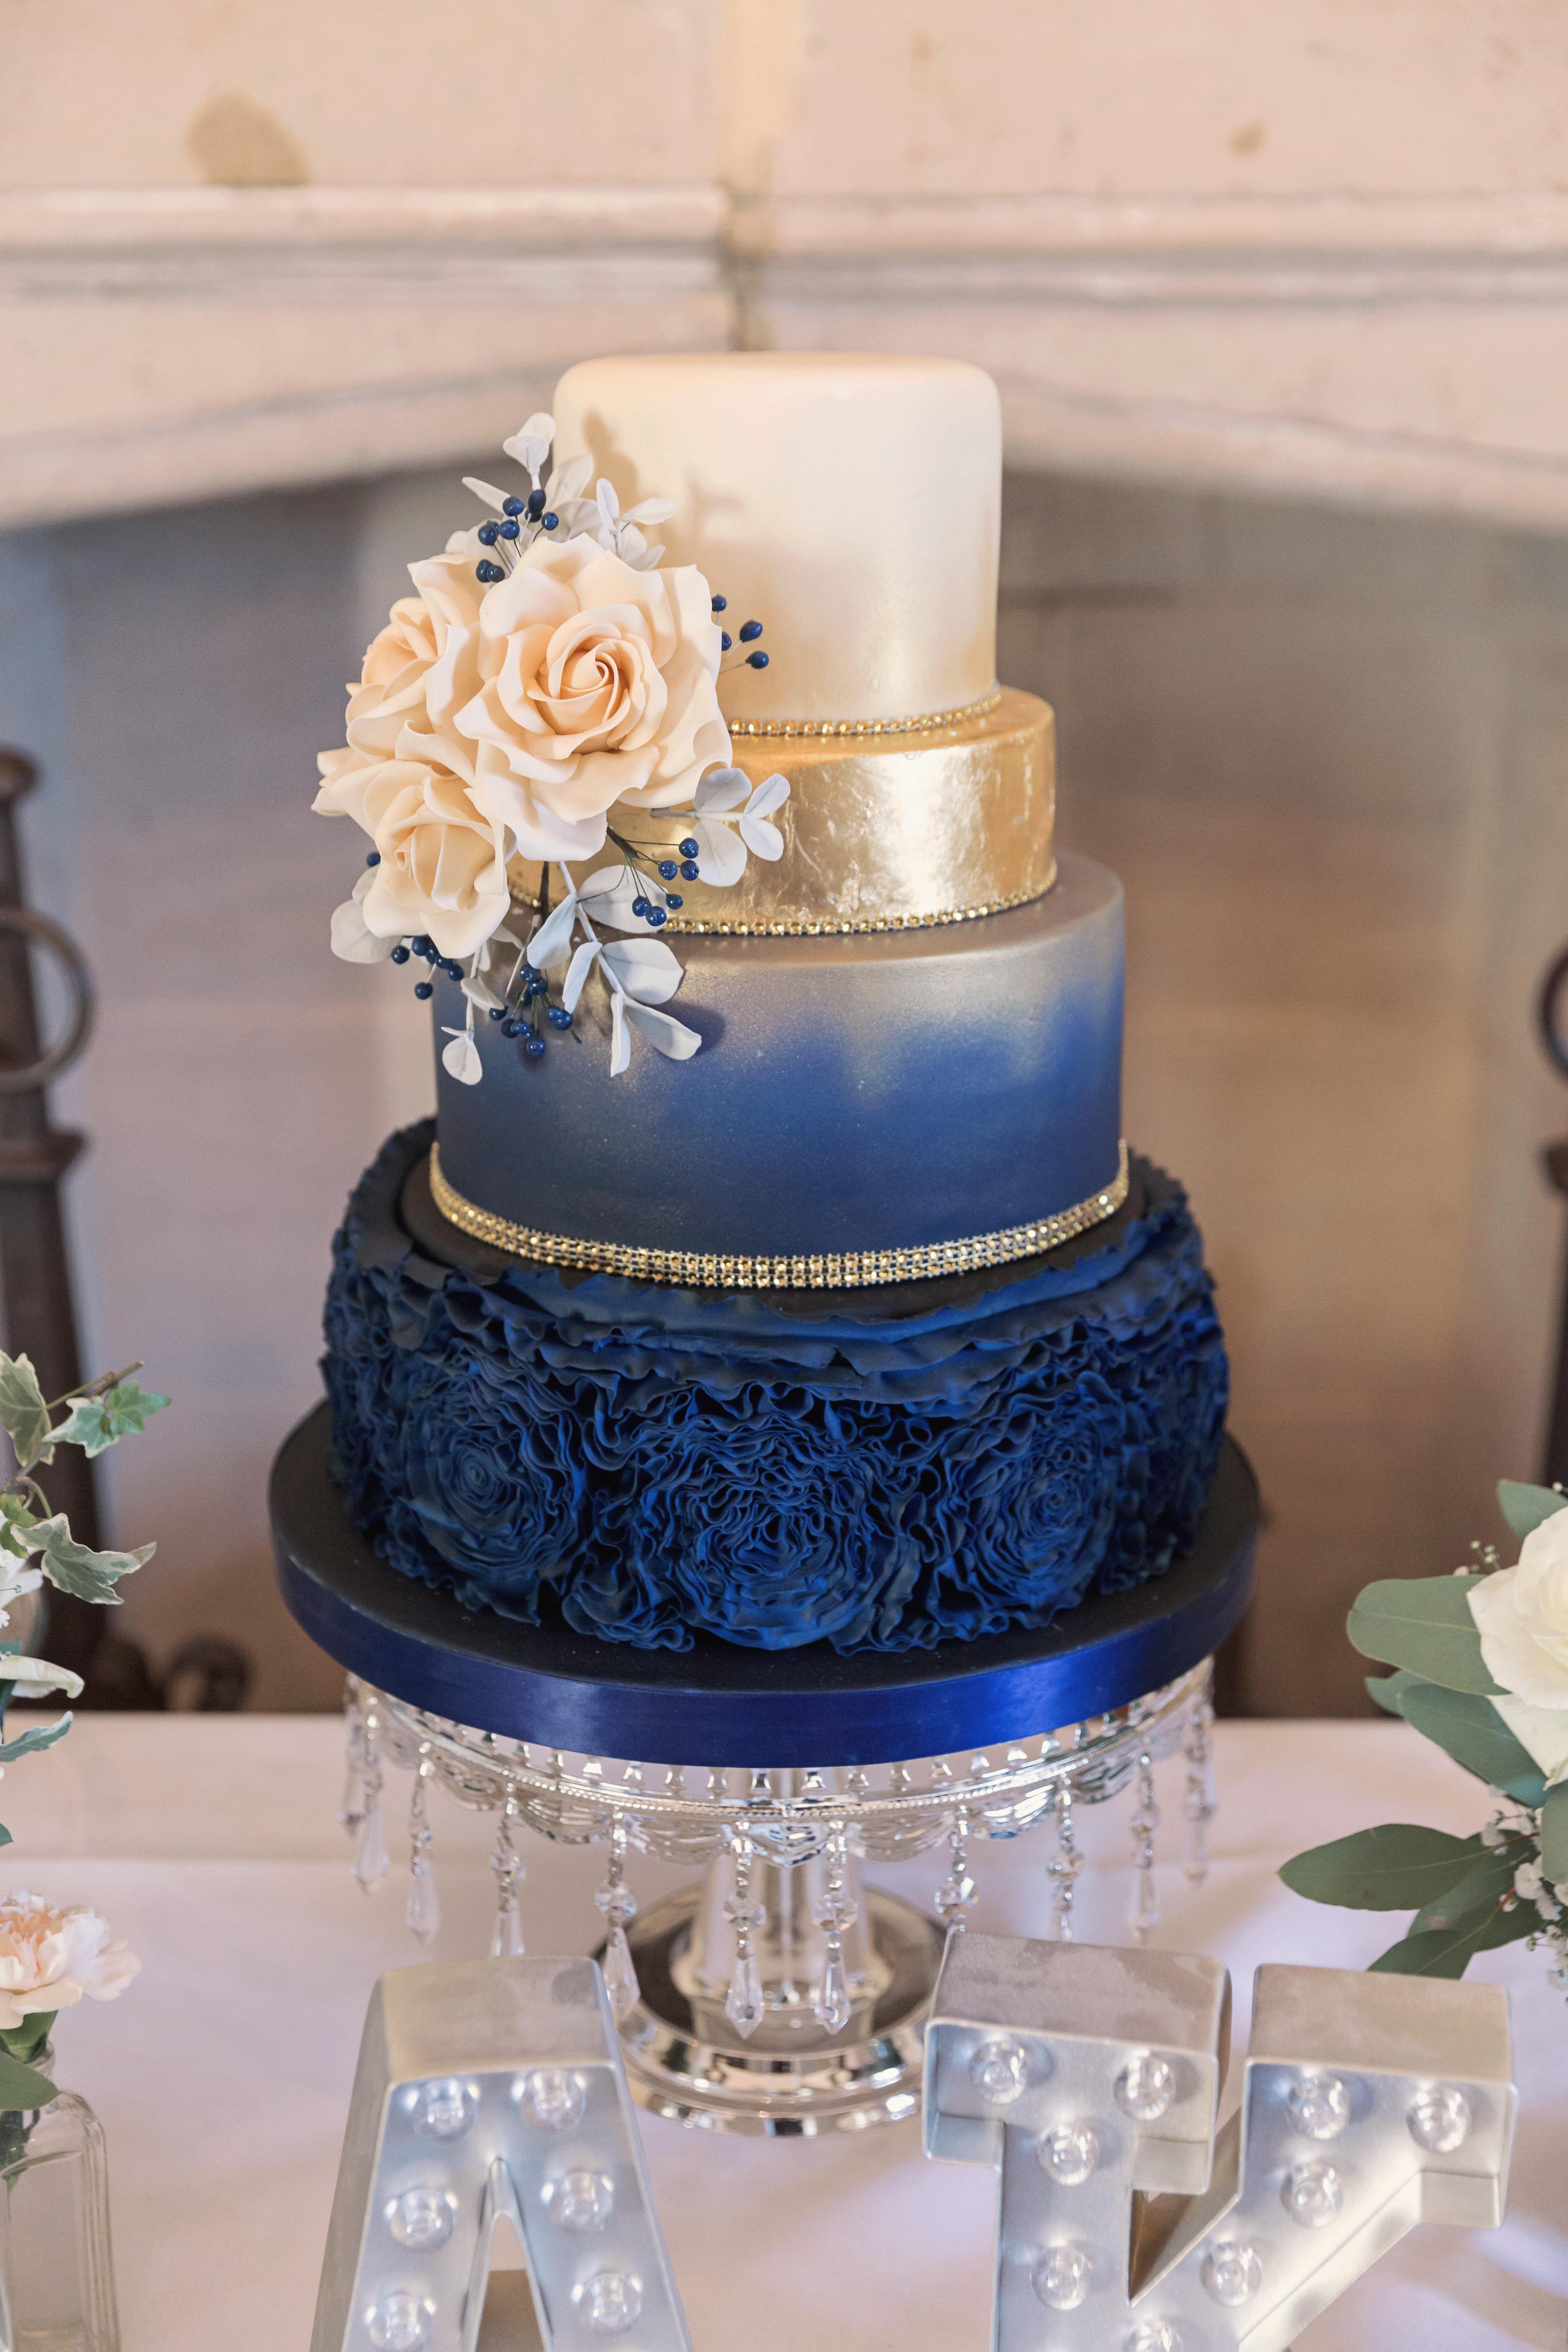 Bespoke Artisan Wedding Cakes In Cambridgeshire